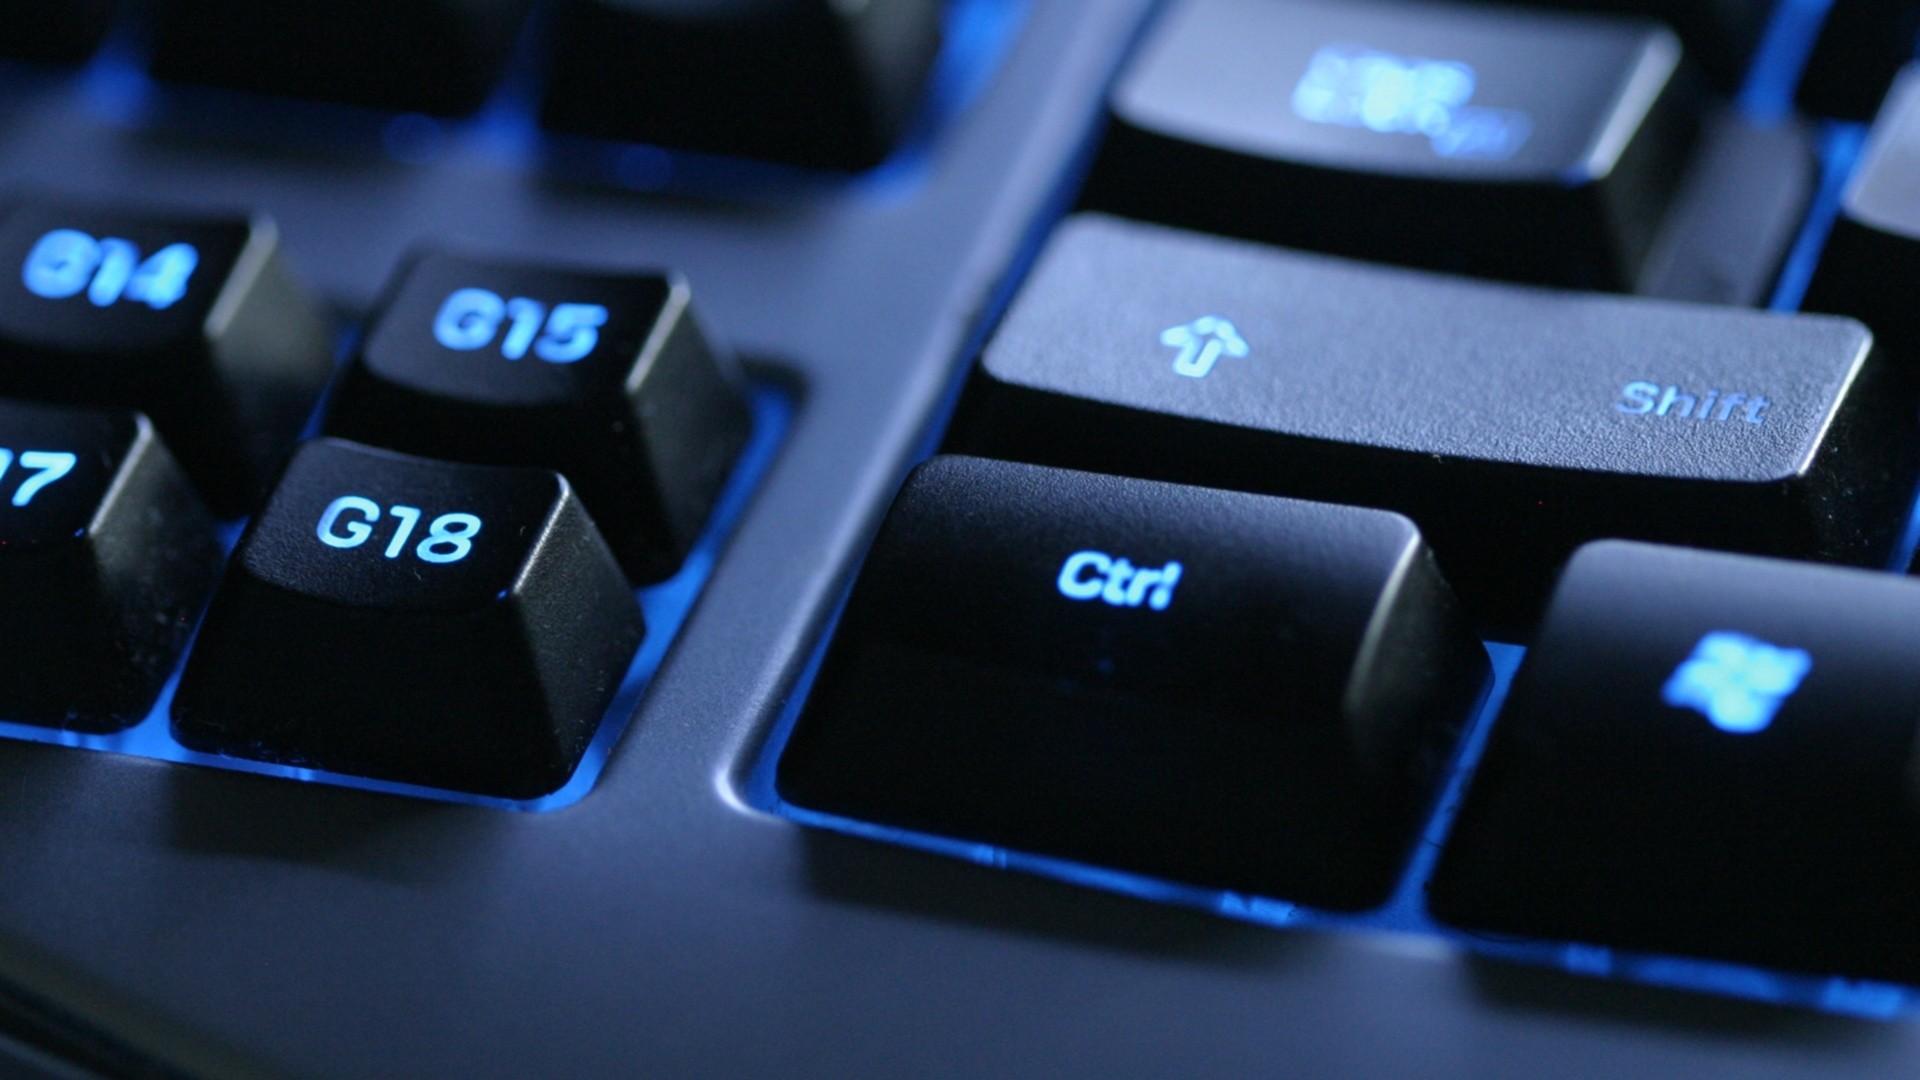 keyboard, blue, black